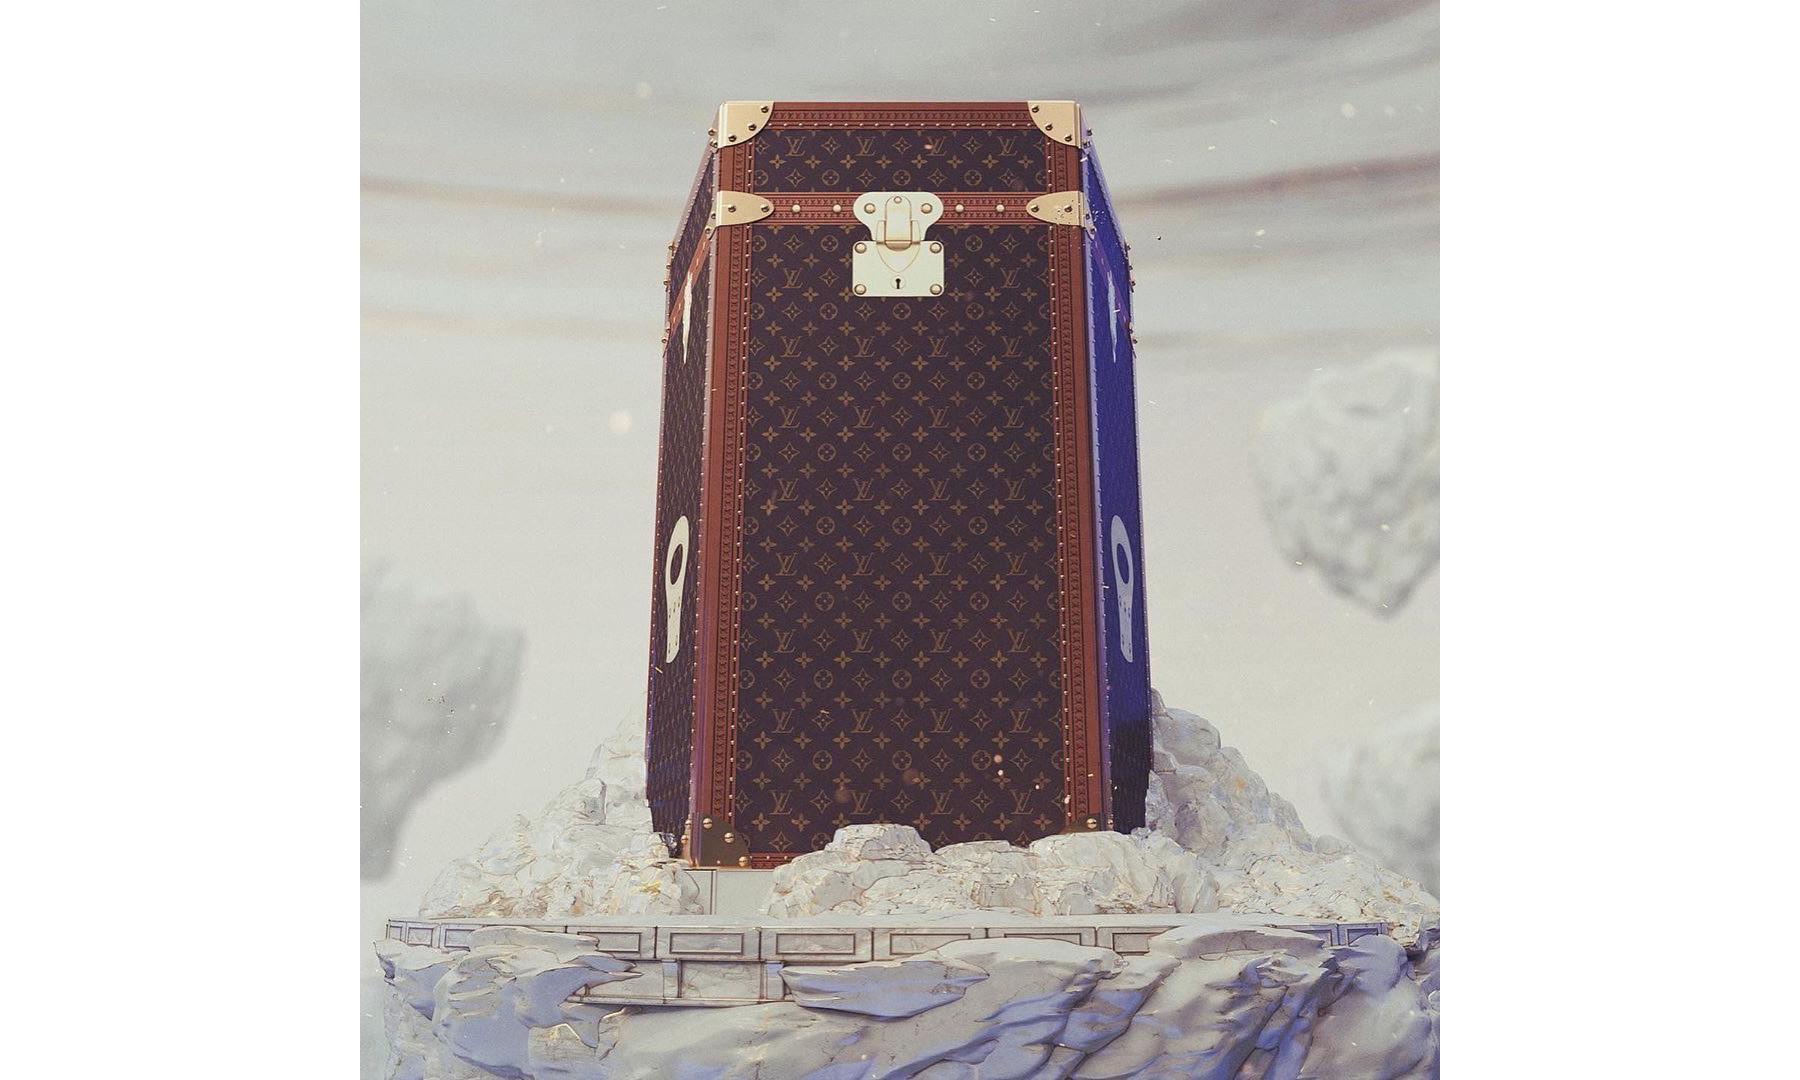 Louis Vuitton 为《英雄联盟》打造奢华奖杯旅行箱